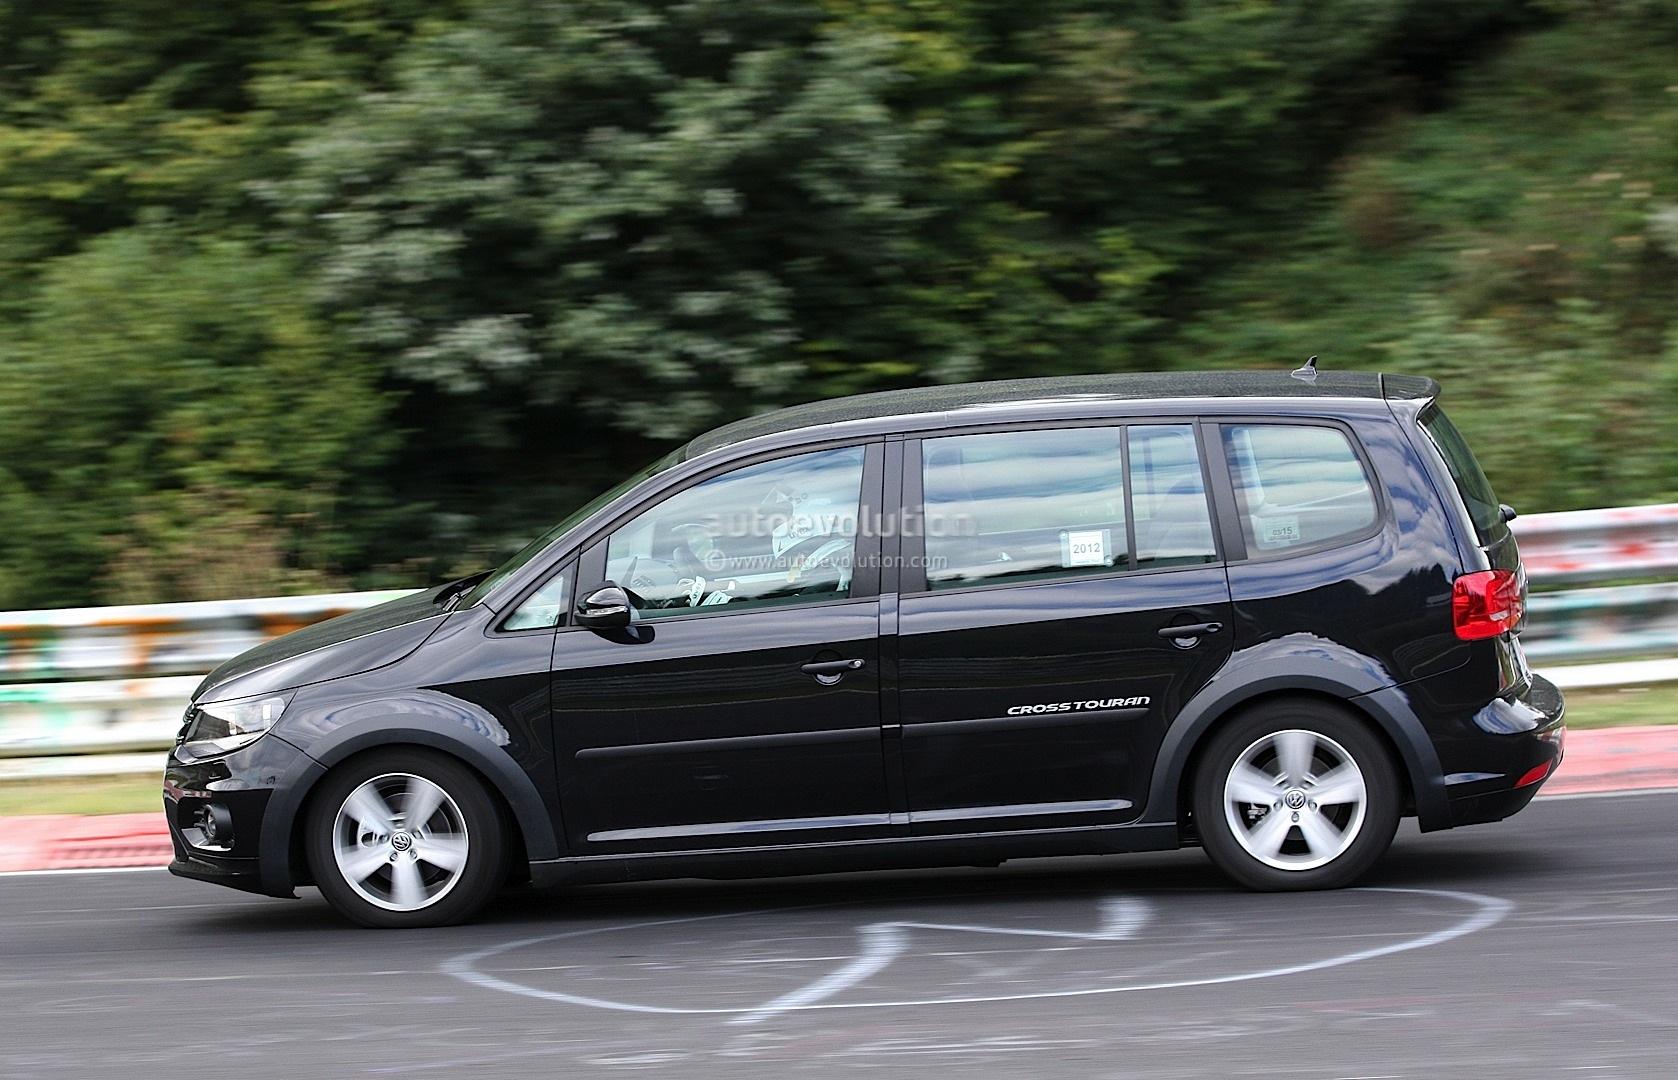 Spyshots: New Volkswagen Touran / Crosstouran - autoevolution